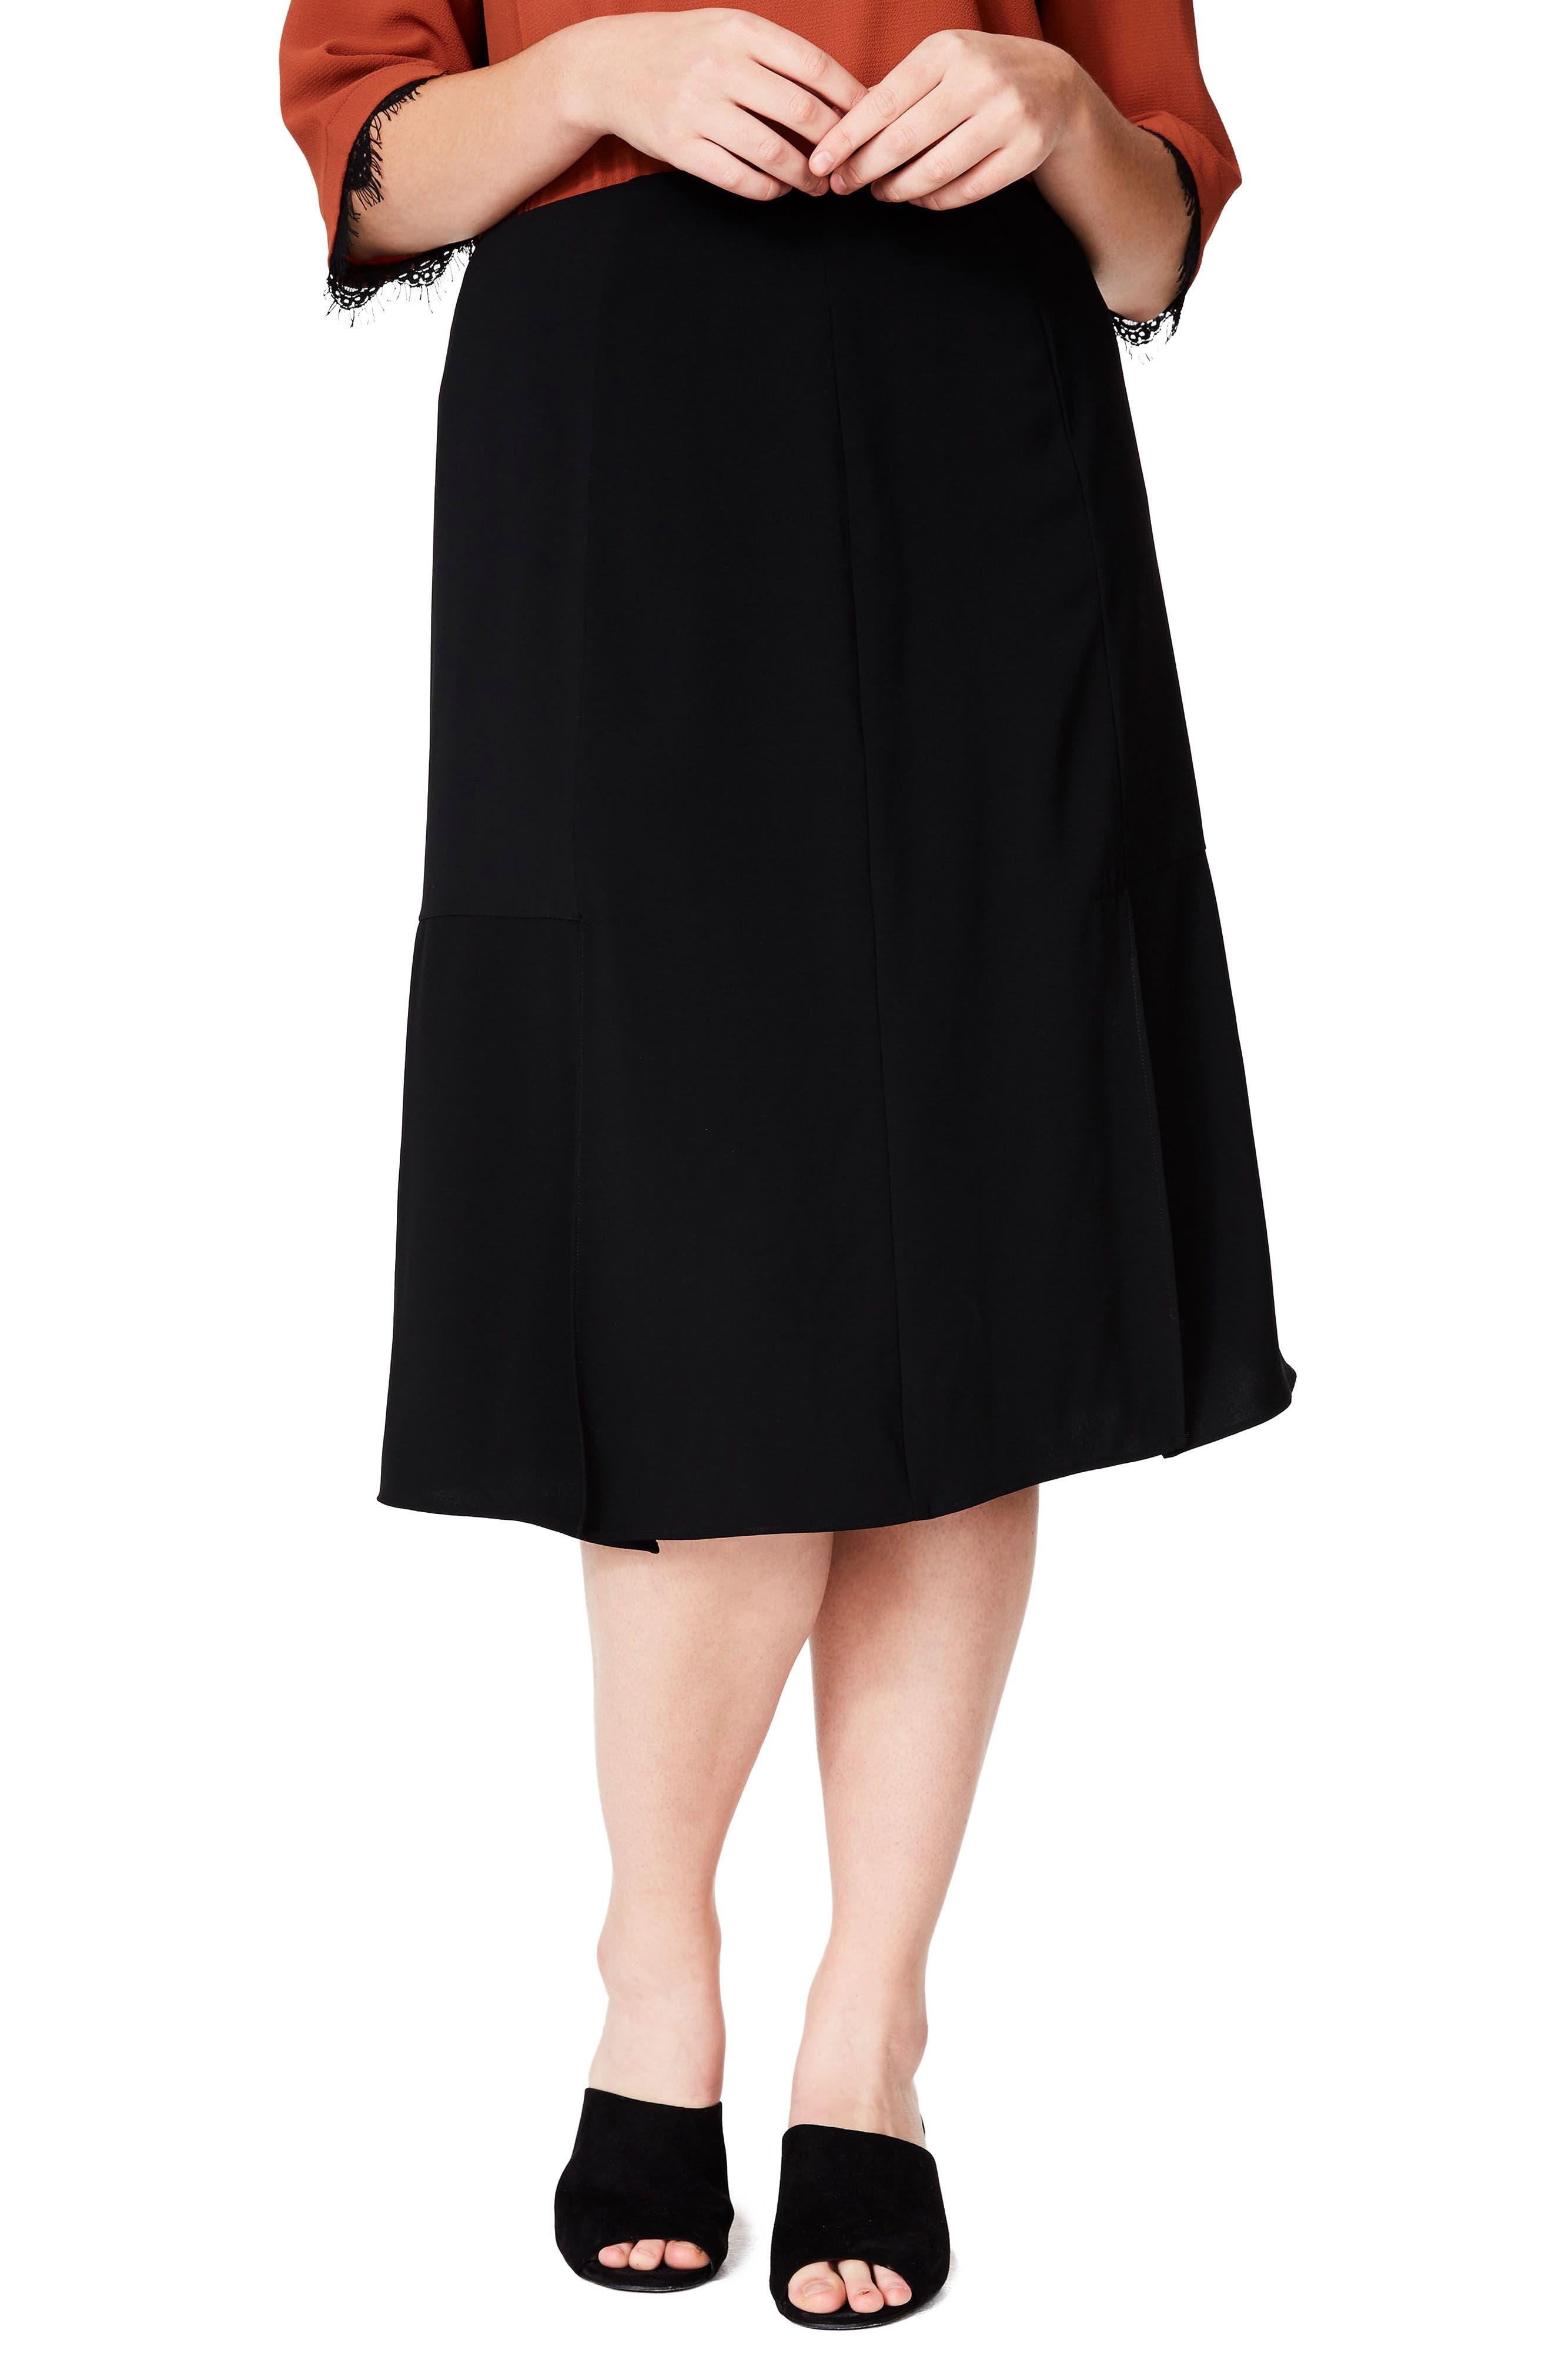 Alternate Image 1 Selected - ELVI Slit A-Line Skirt (Plus Size)